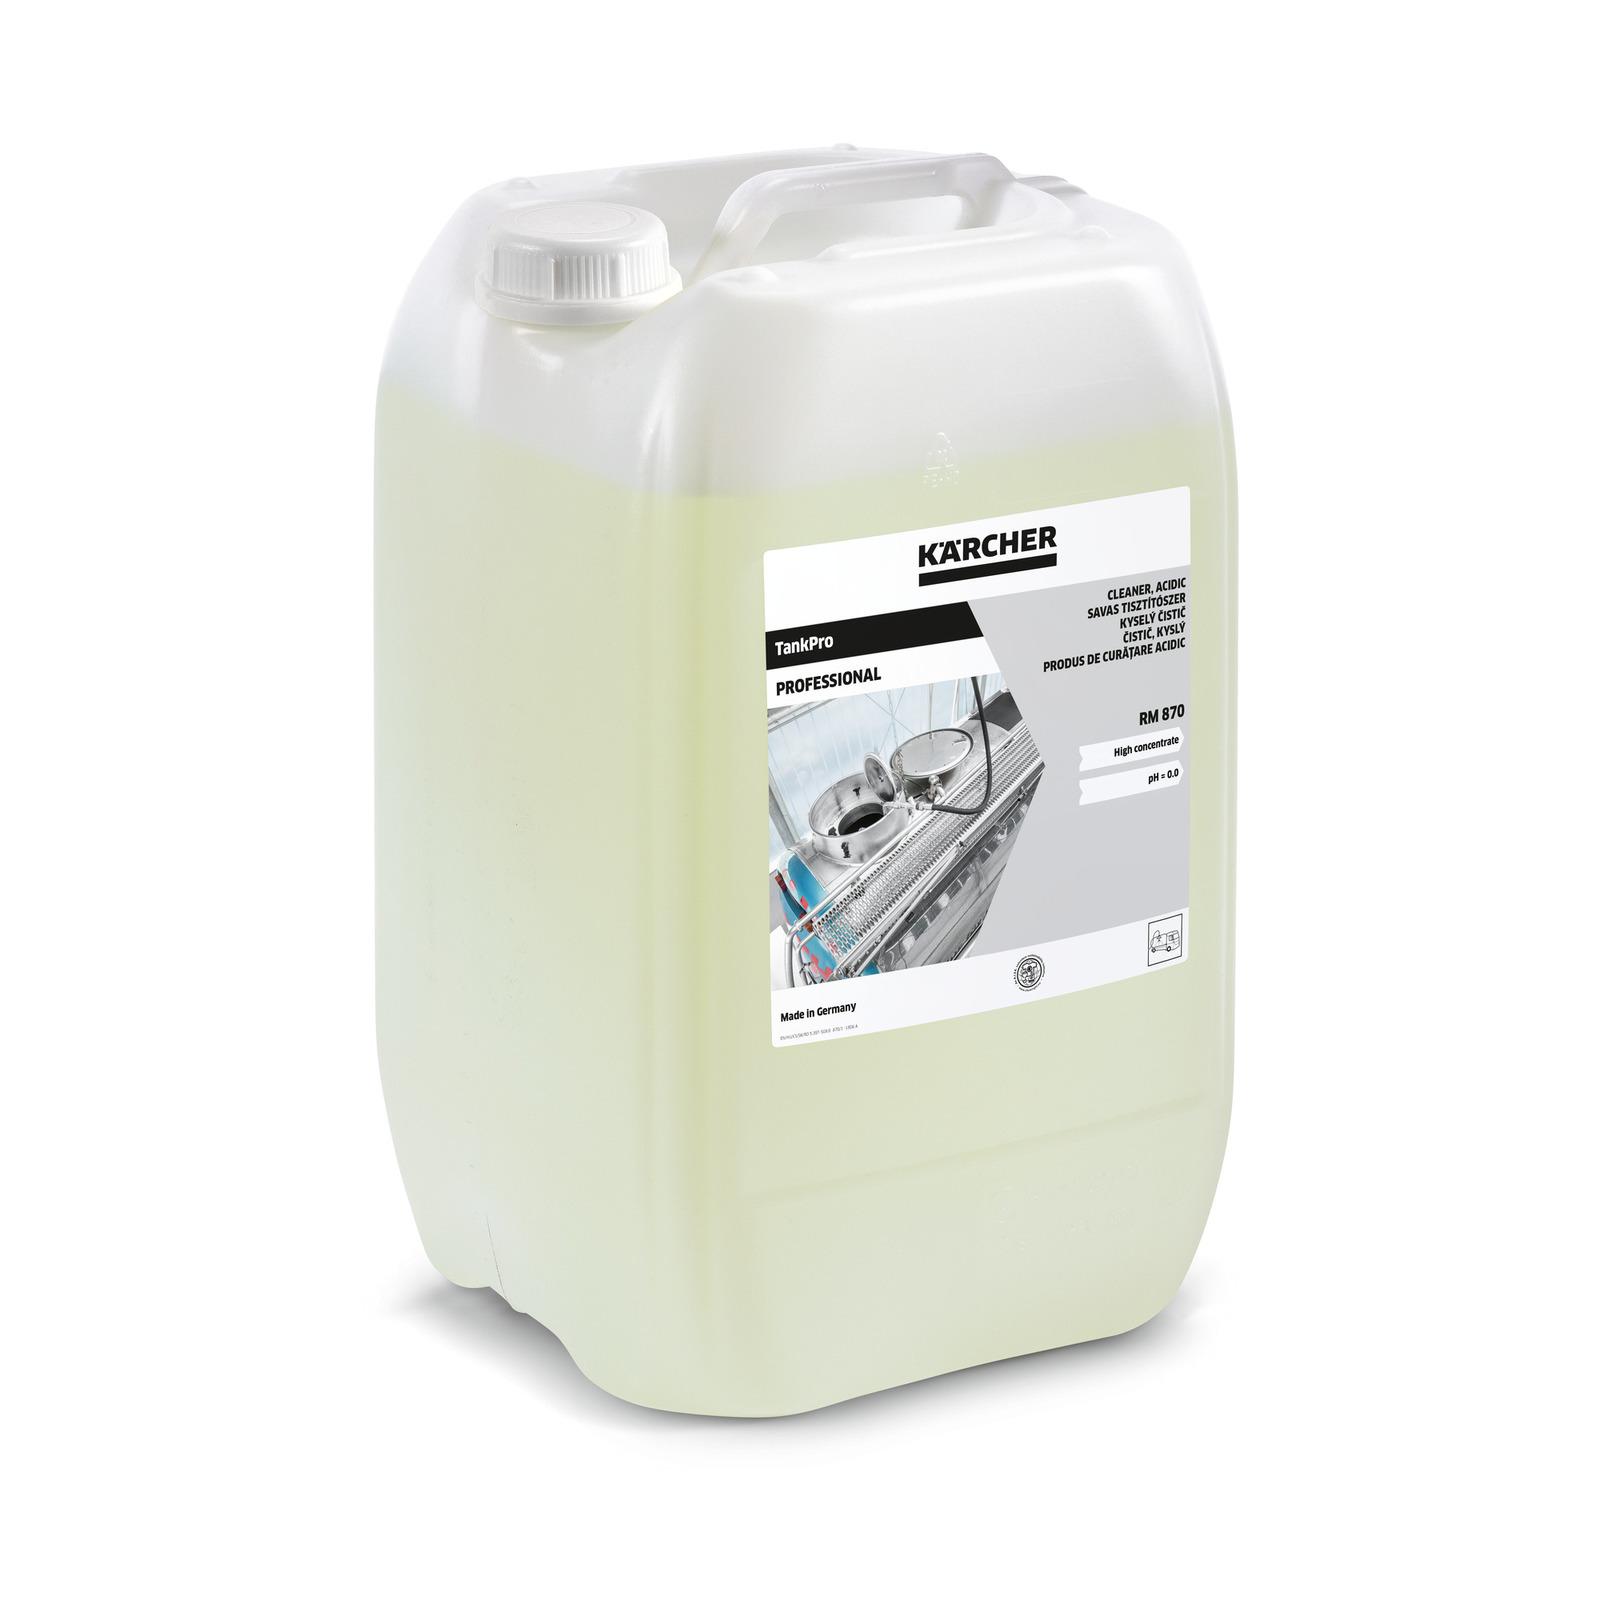 TankPro Reiniger, sauer RM 870, 20 l | Kärcher International